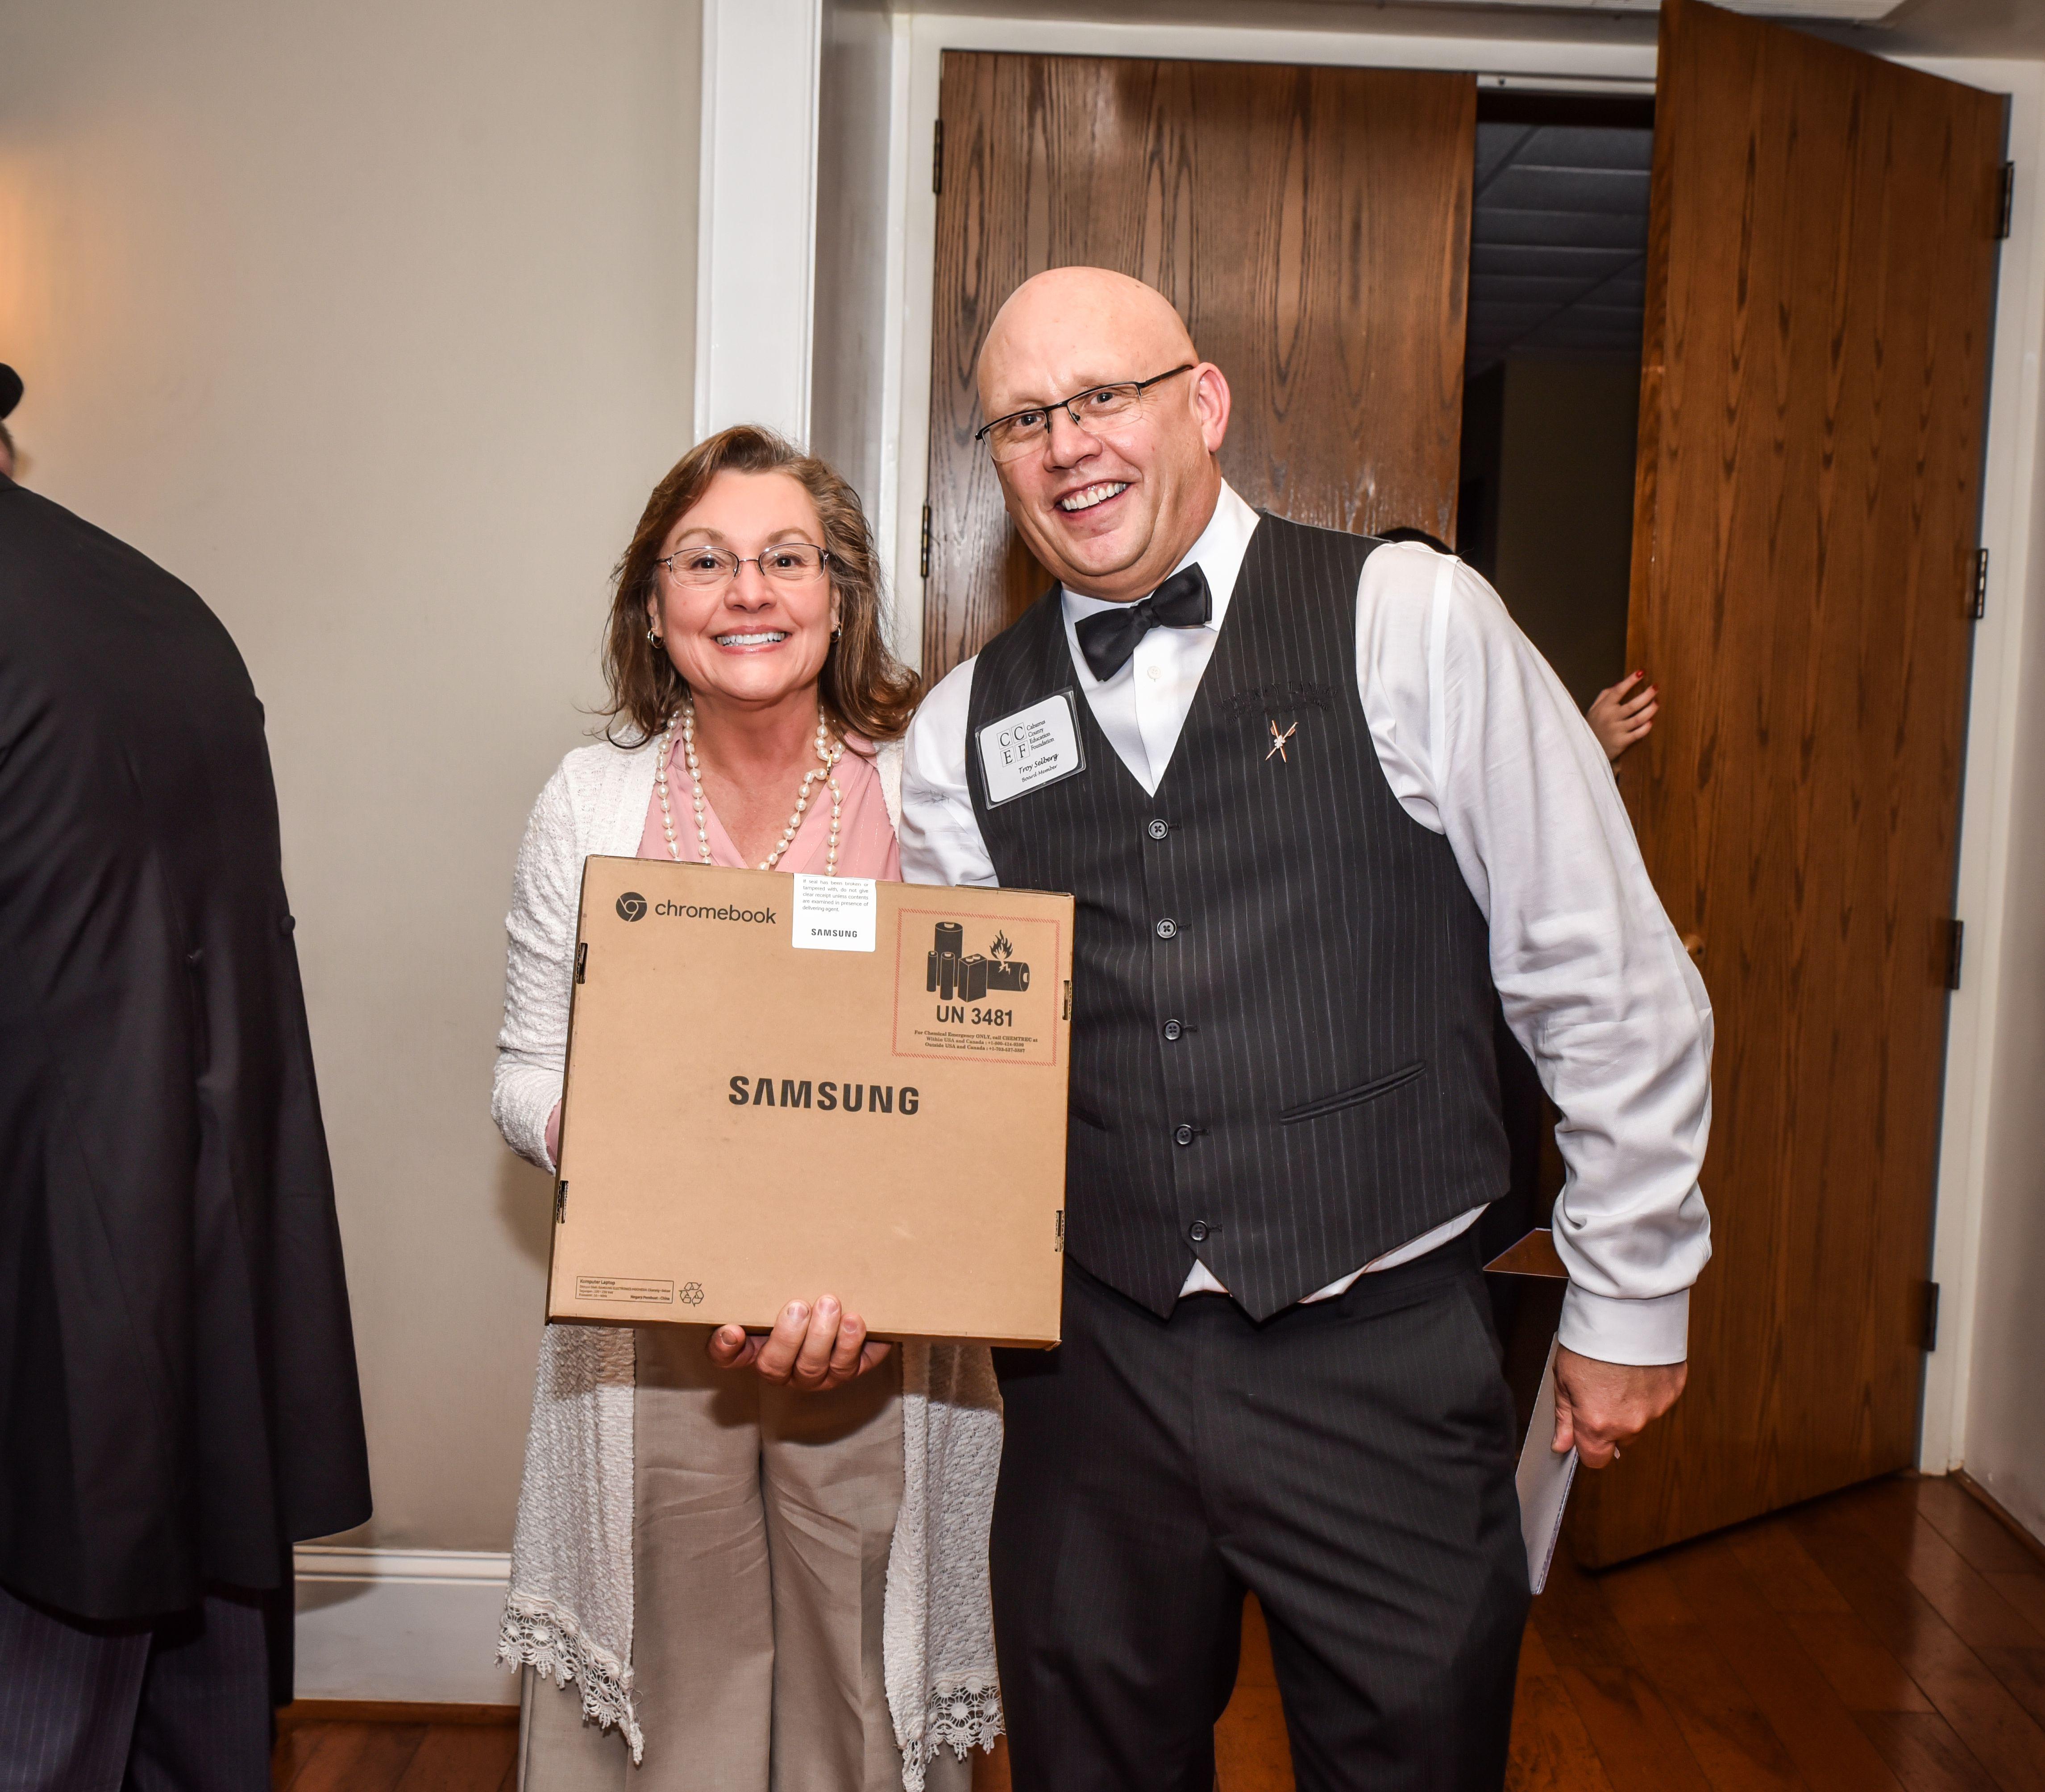 Pam Wilkerson Winning Laptop